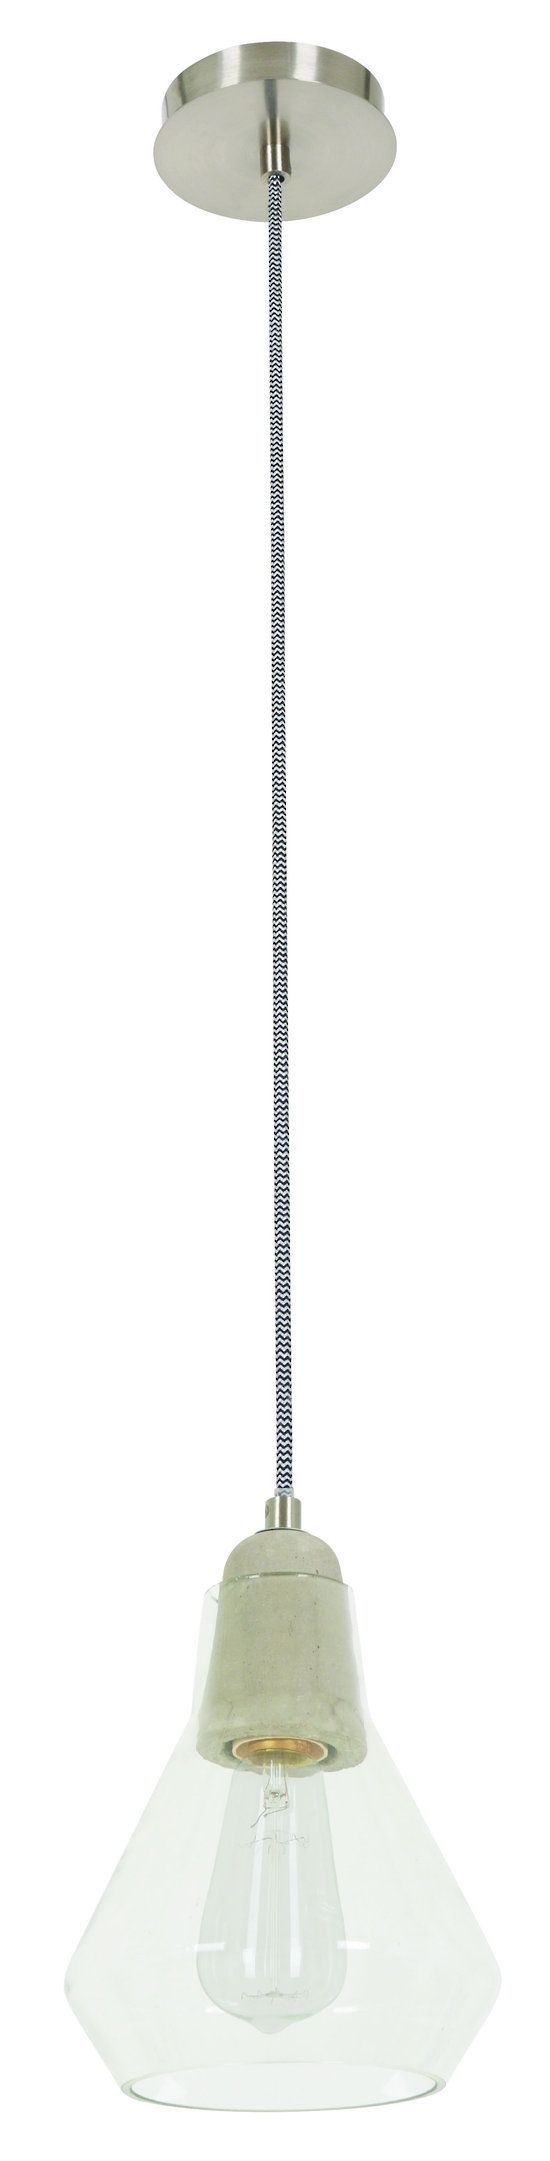 ANDO CONCRETE & GLASS PENDANT - Modern Pendants - Pendant Lights - LIGHTING DIRECT LIMITED